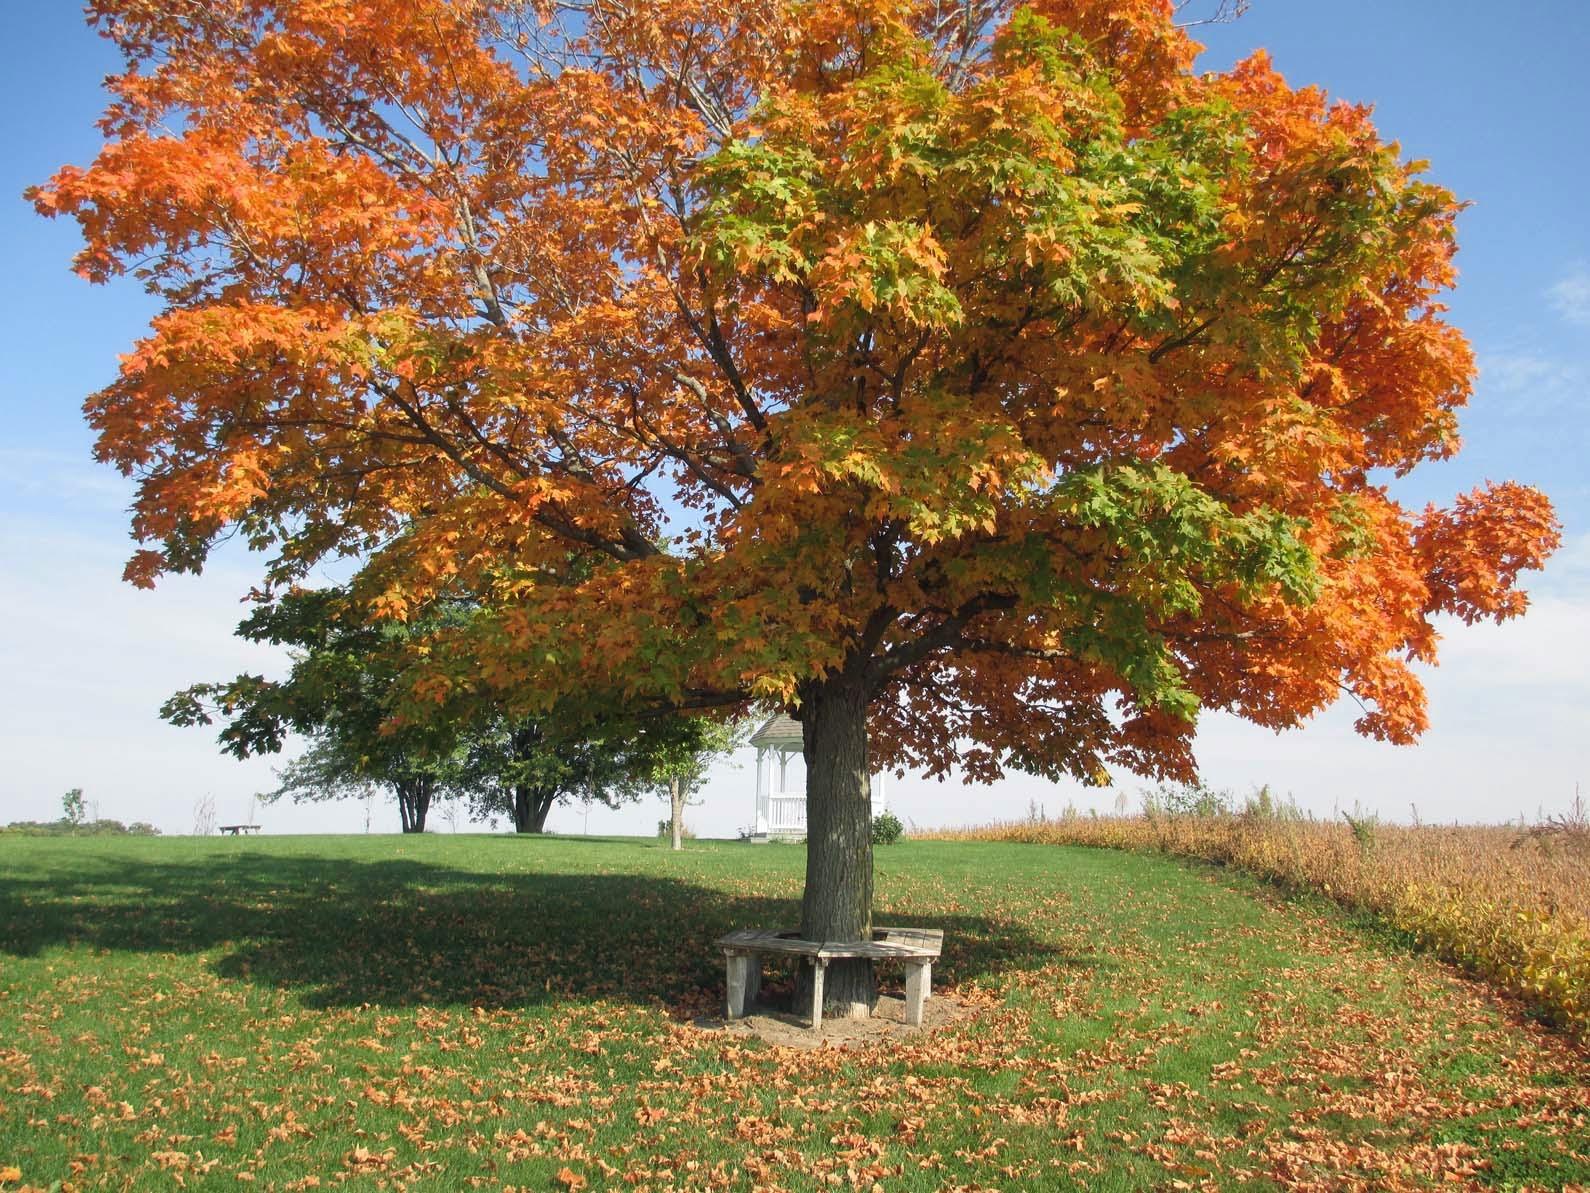 Autumn Leaves Ground